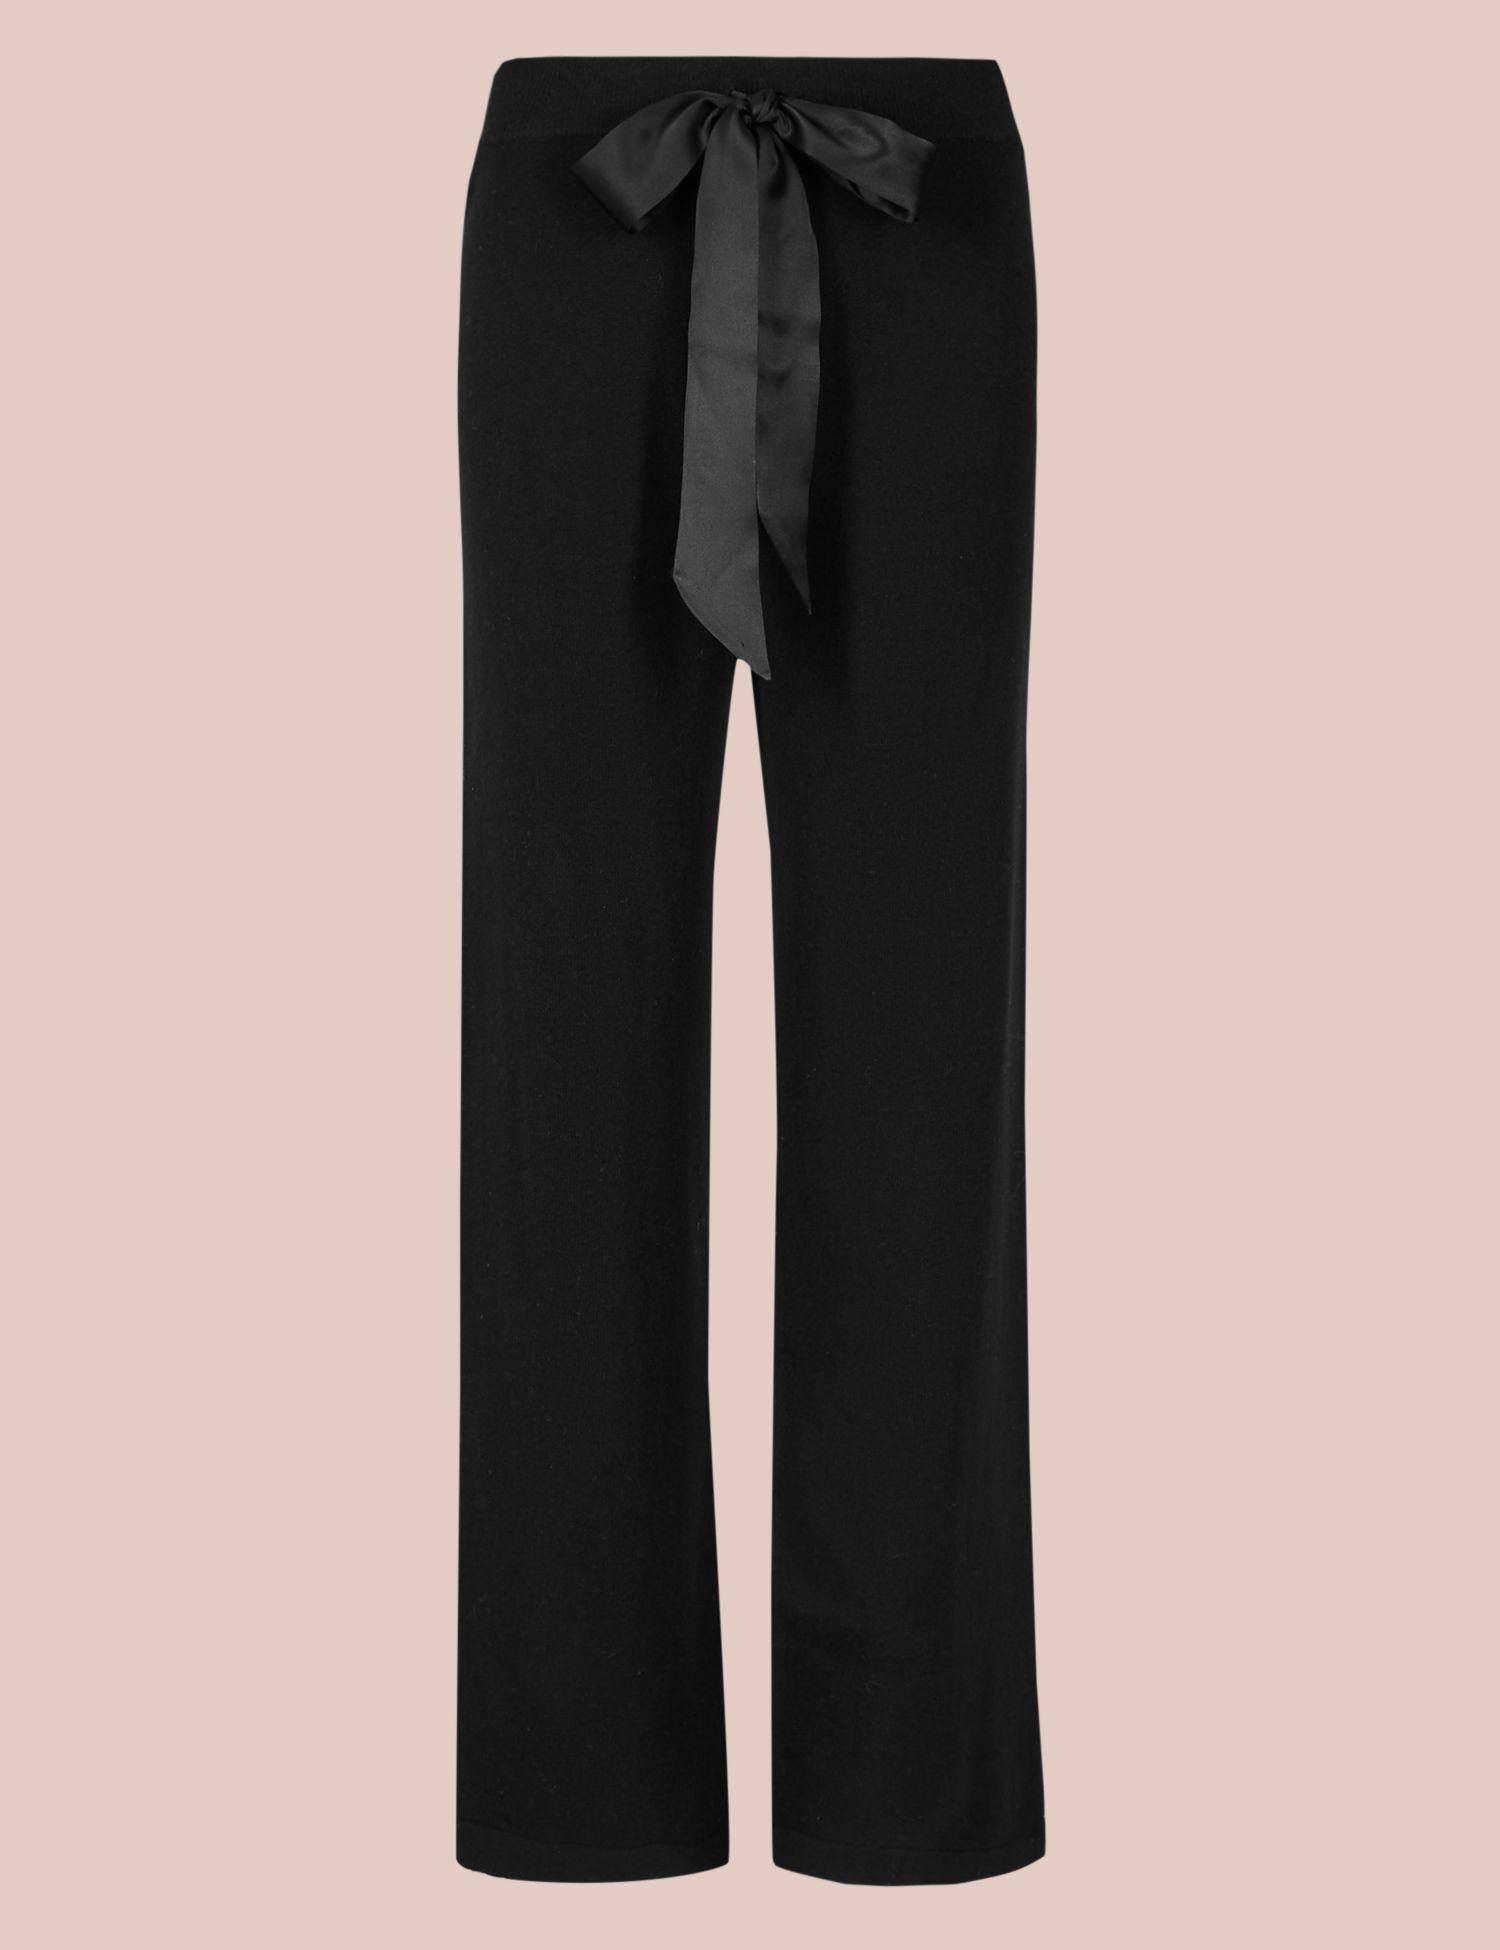 b1e3c89beb6c Marks   Spencer Pure Cashmere Pyjama Bottoms in Black - Lyst